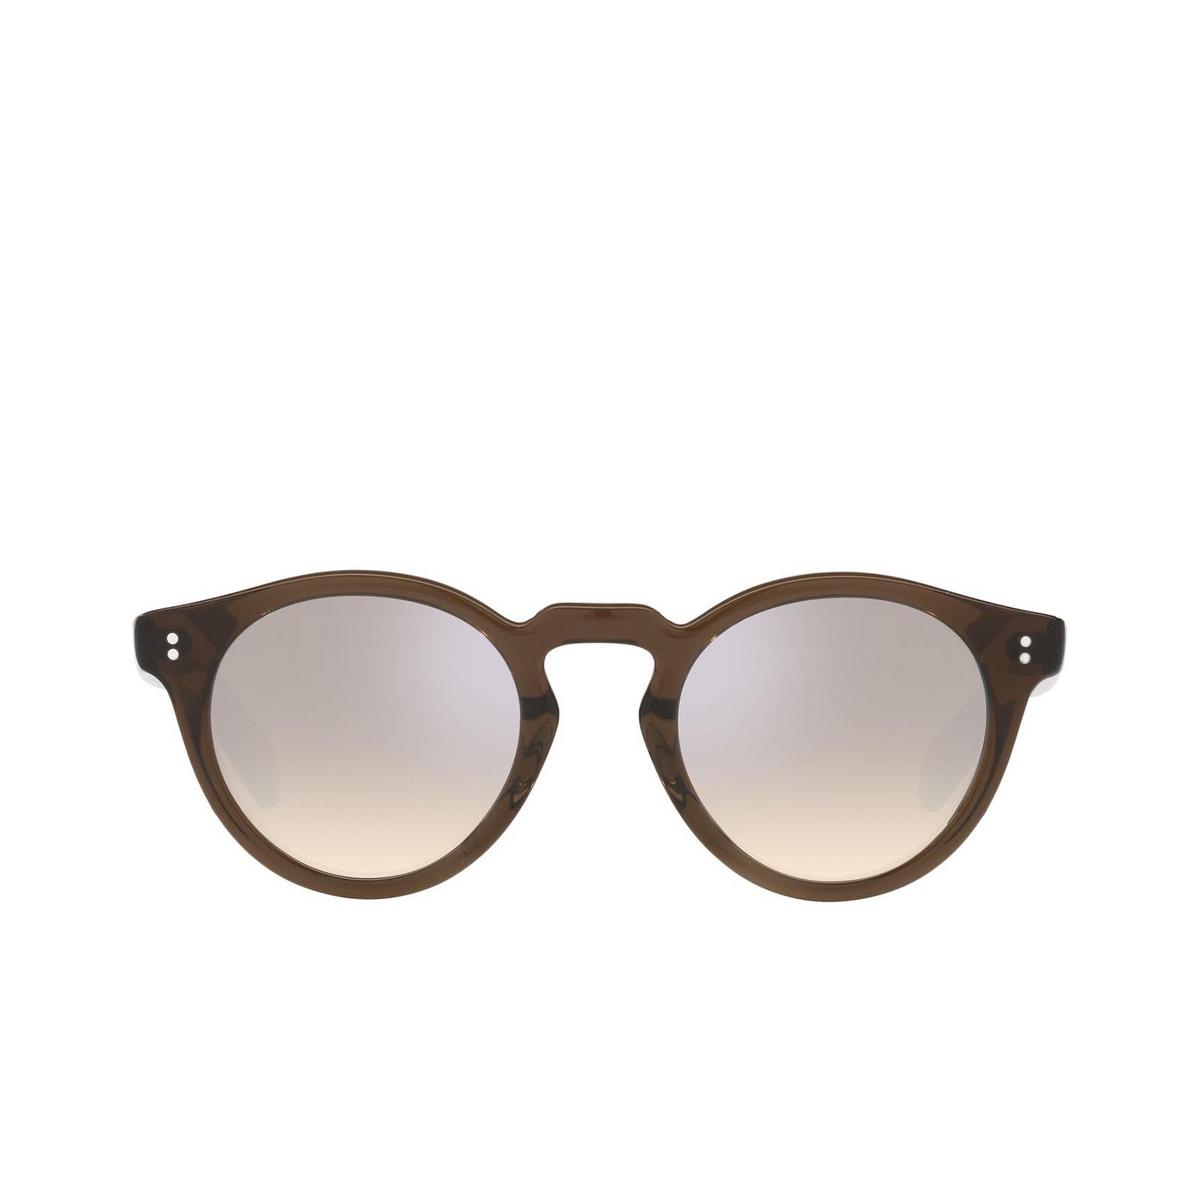 Oliver Peoples® Round Sunglasses: Martineaux OV5450SU color Espresso 162532 - front view.